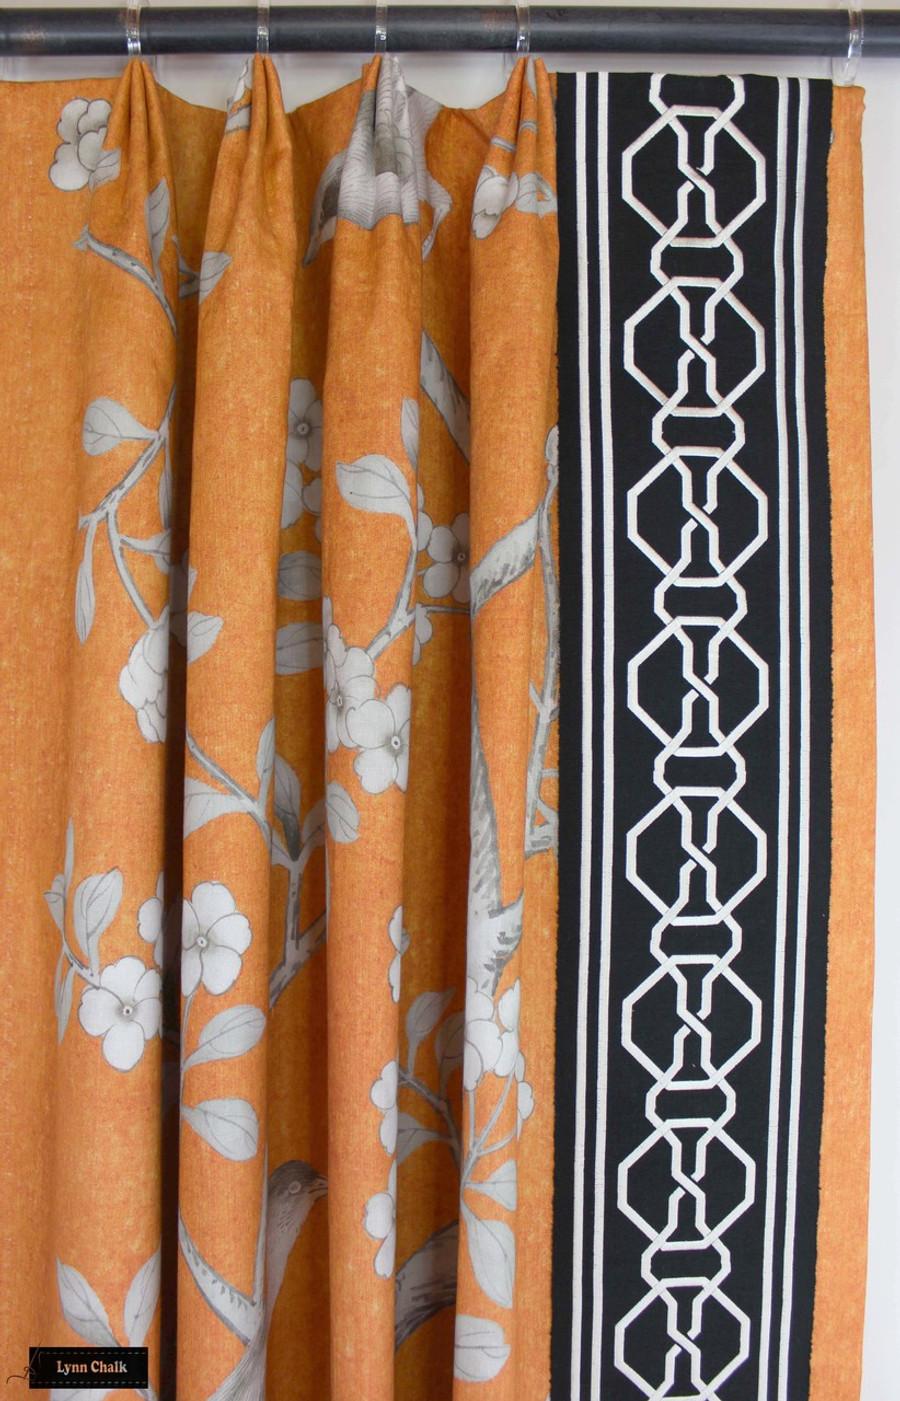 Mary McDonald Chinois Palais in Tangerine with Malmaison Trim in Noir/Swan (Custom Made by Lynn Chalk)